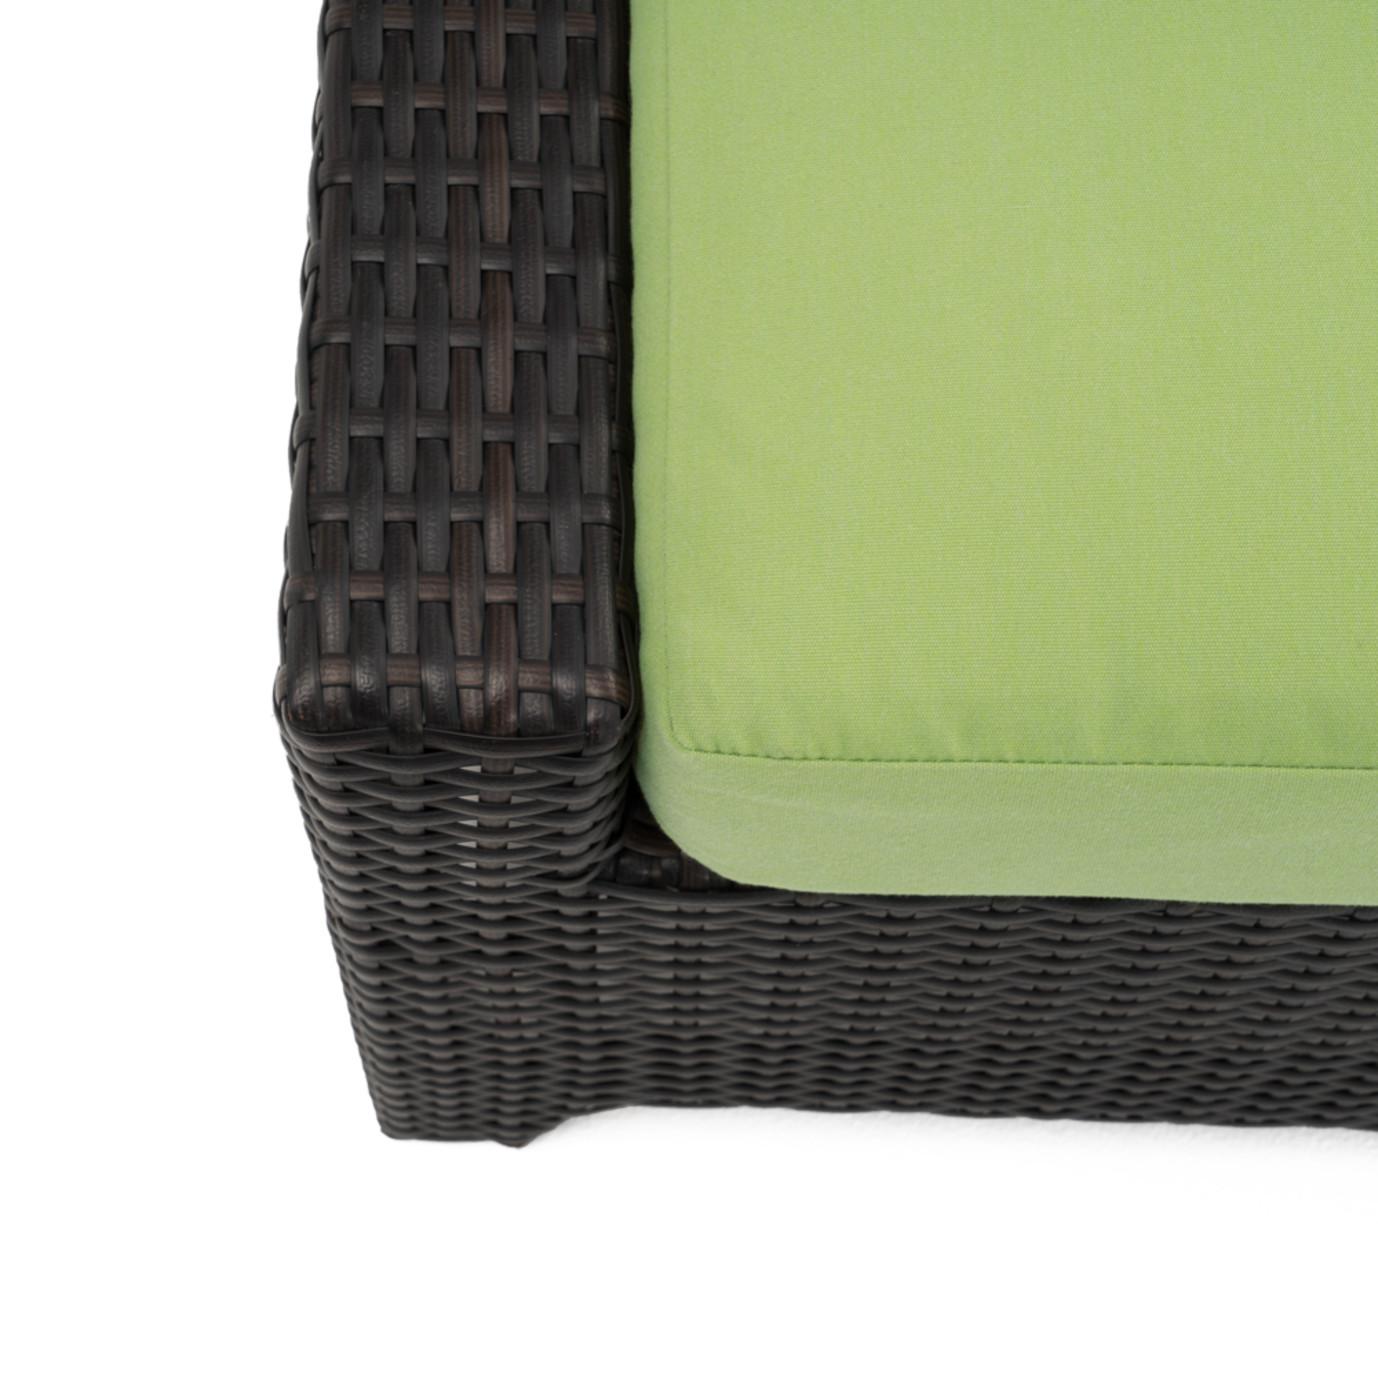 Deco™ 8pc Sofa and Club Chair Set - Ginkgo Green